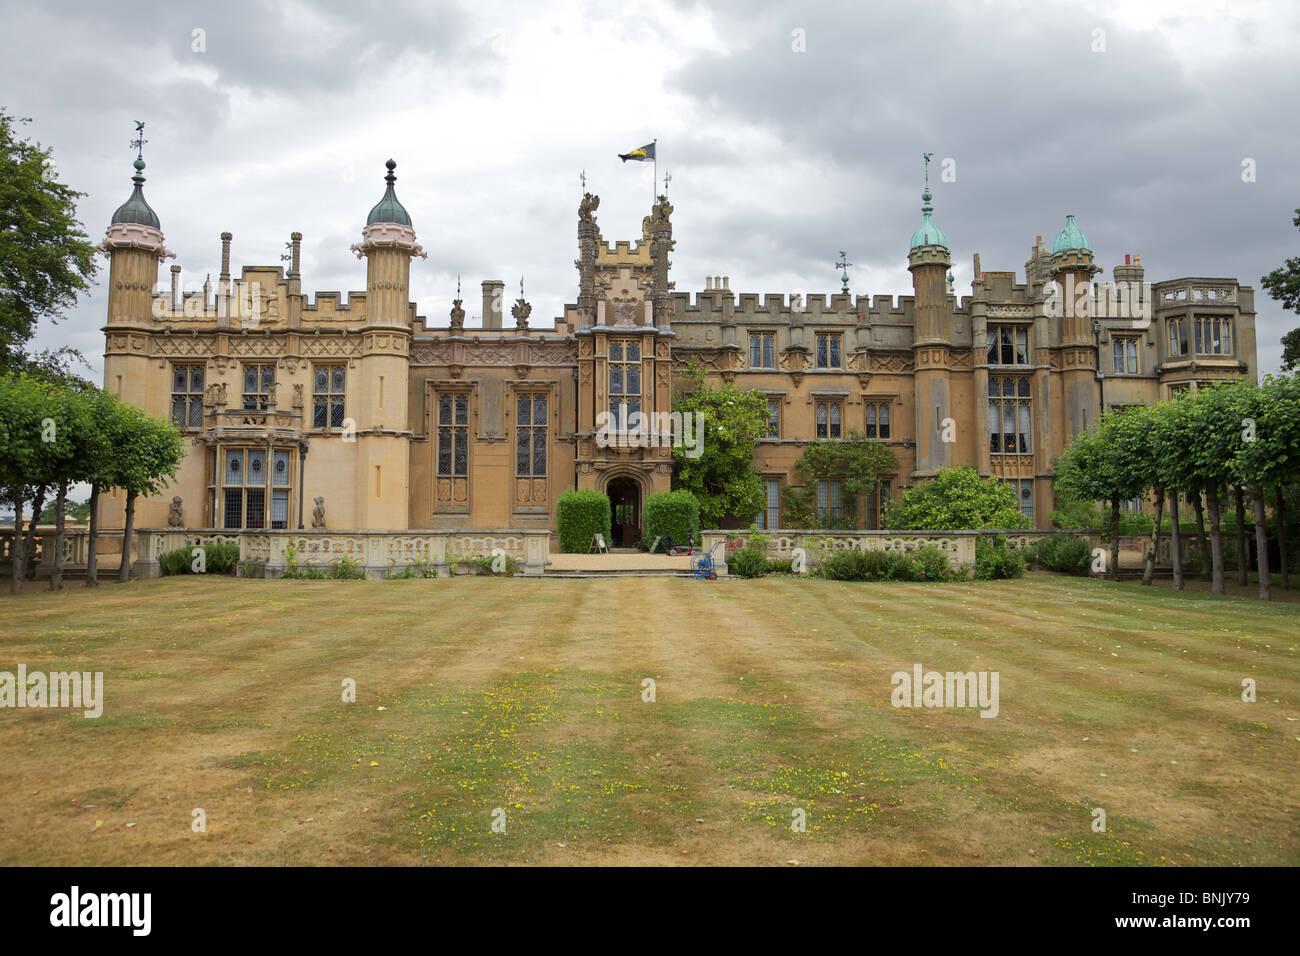 Knebworth House, Hertfordshire, England Haus von Herrn David Lytton Stockbild